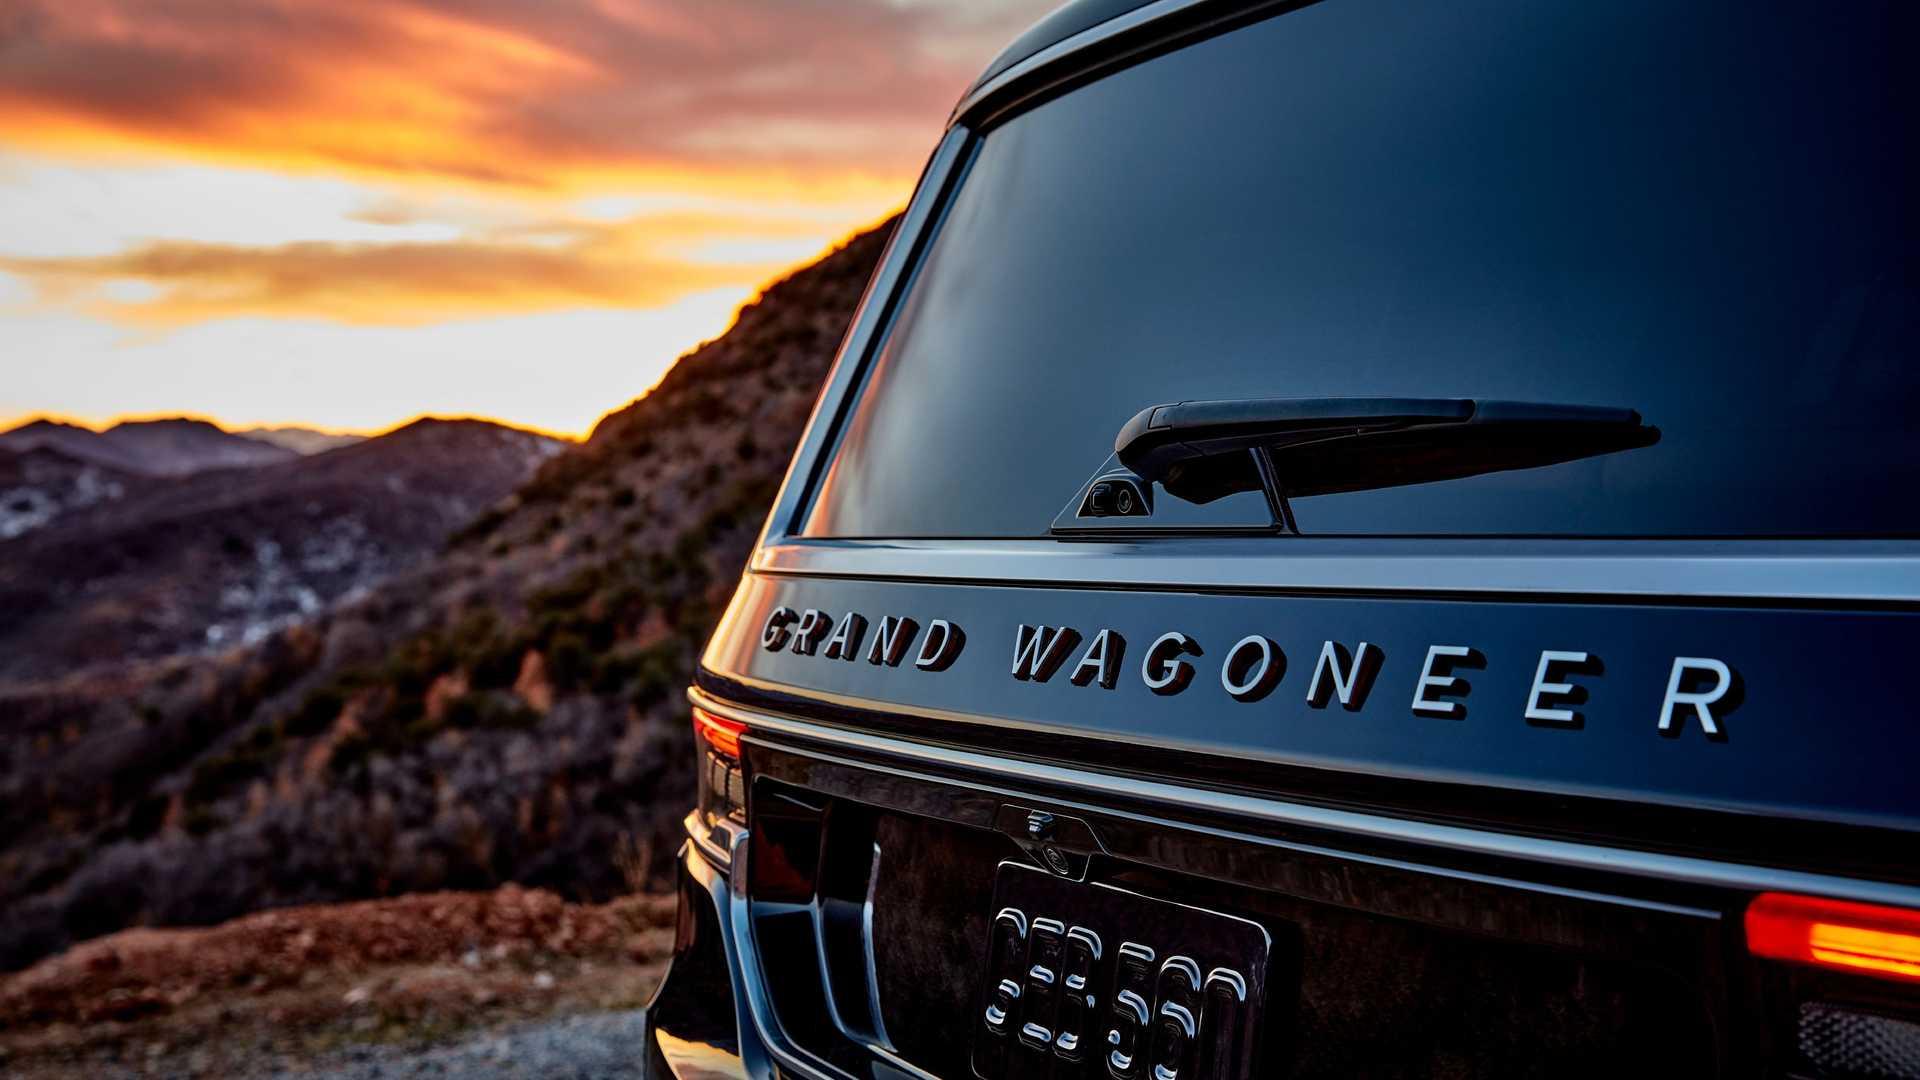 2022-jeep-grand-wagoneer-exterior-badging-4